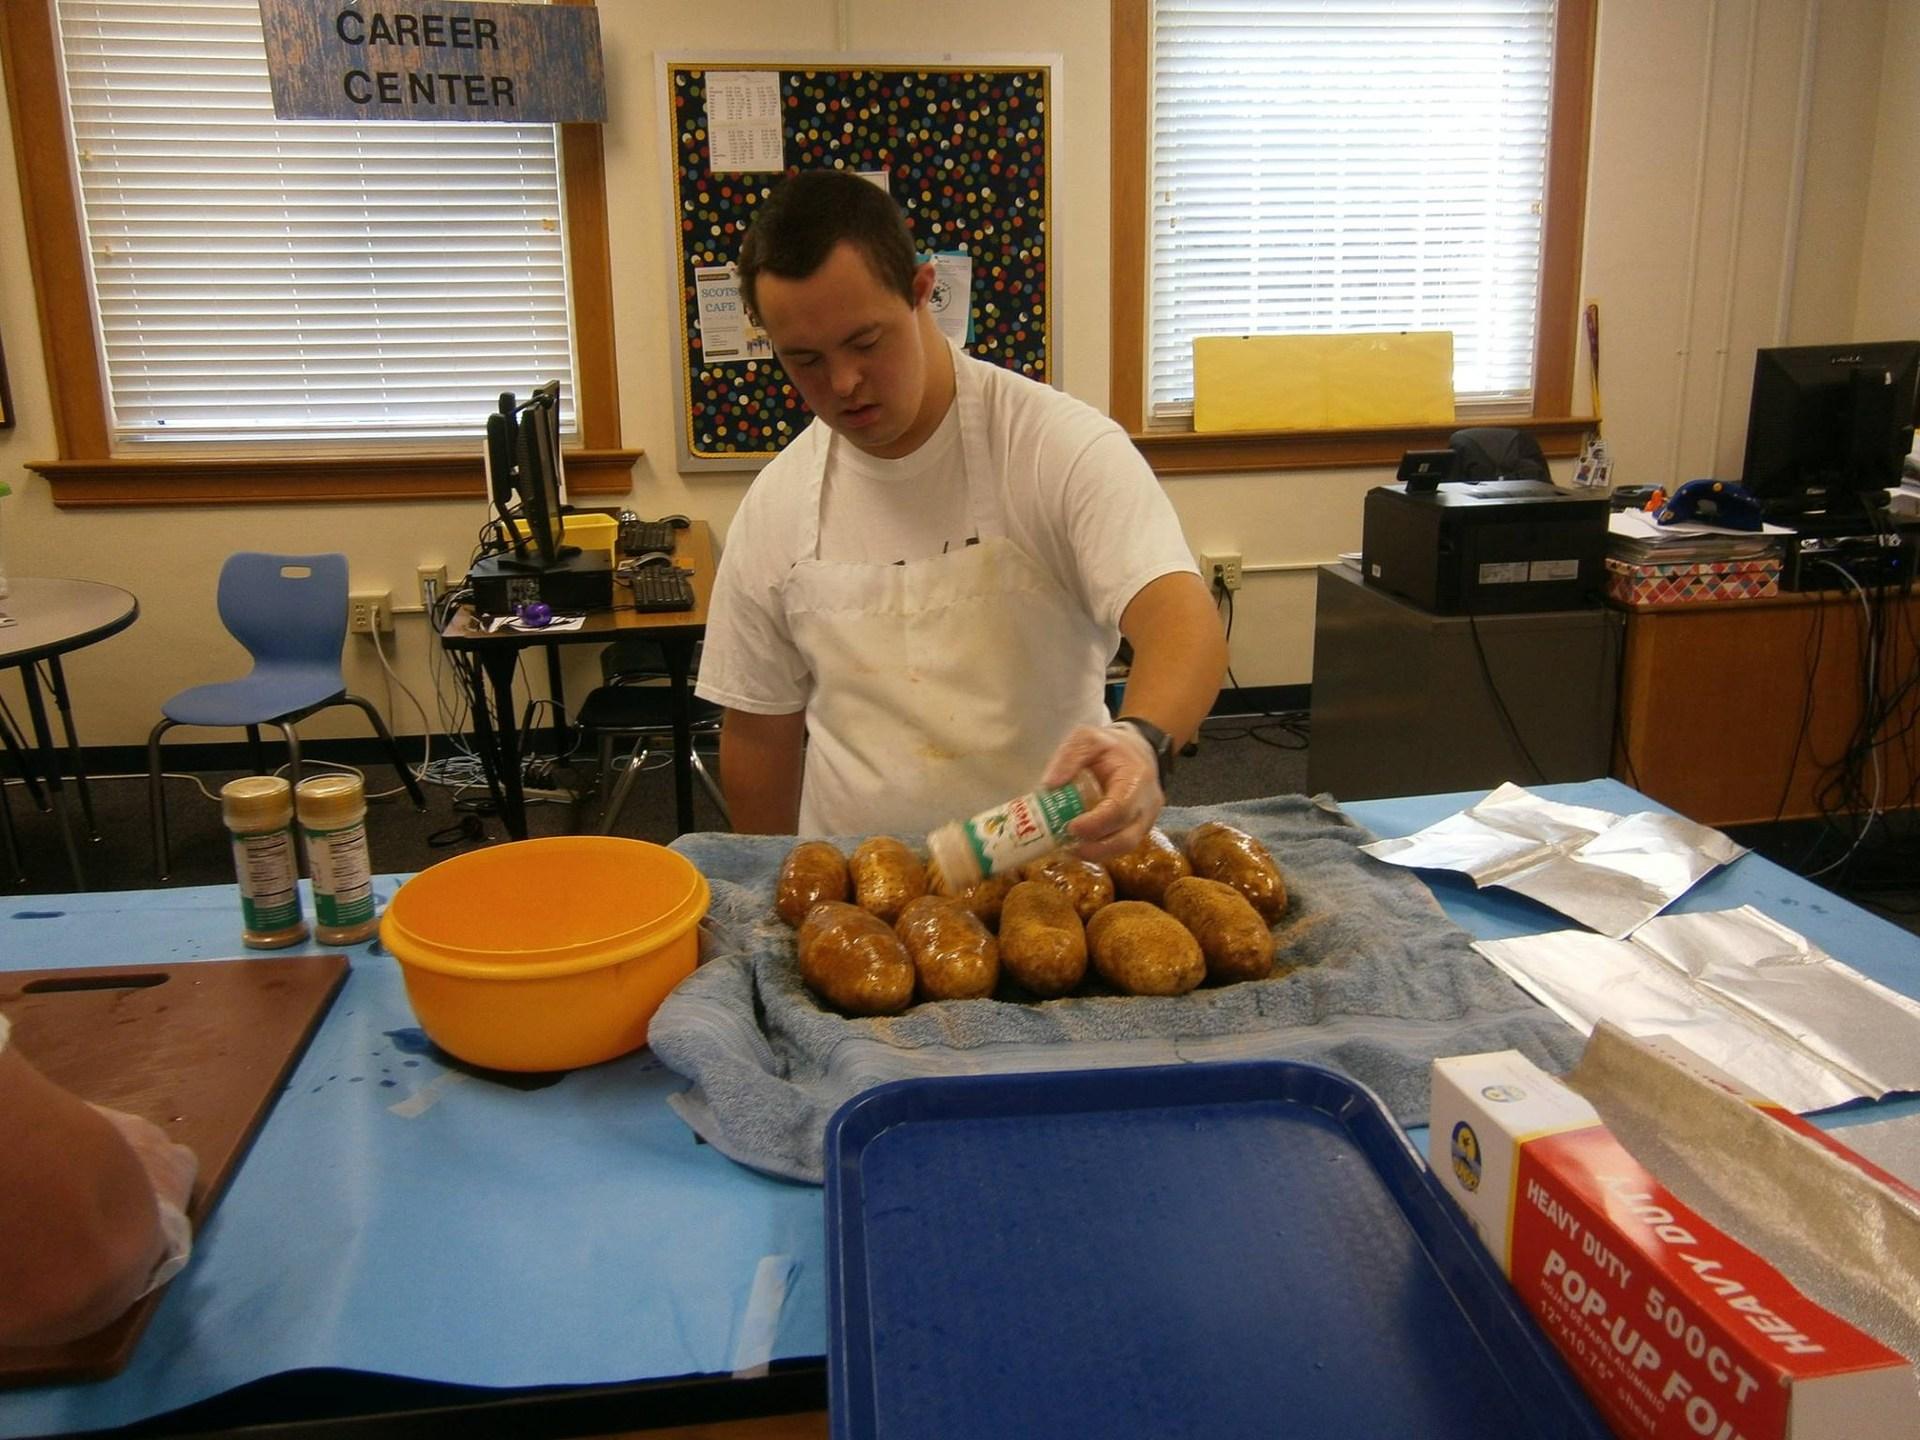 A Scot's Cafe employee seasons a mound of fresh baked potatoes.